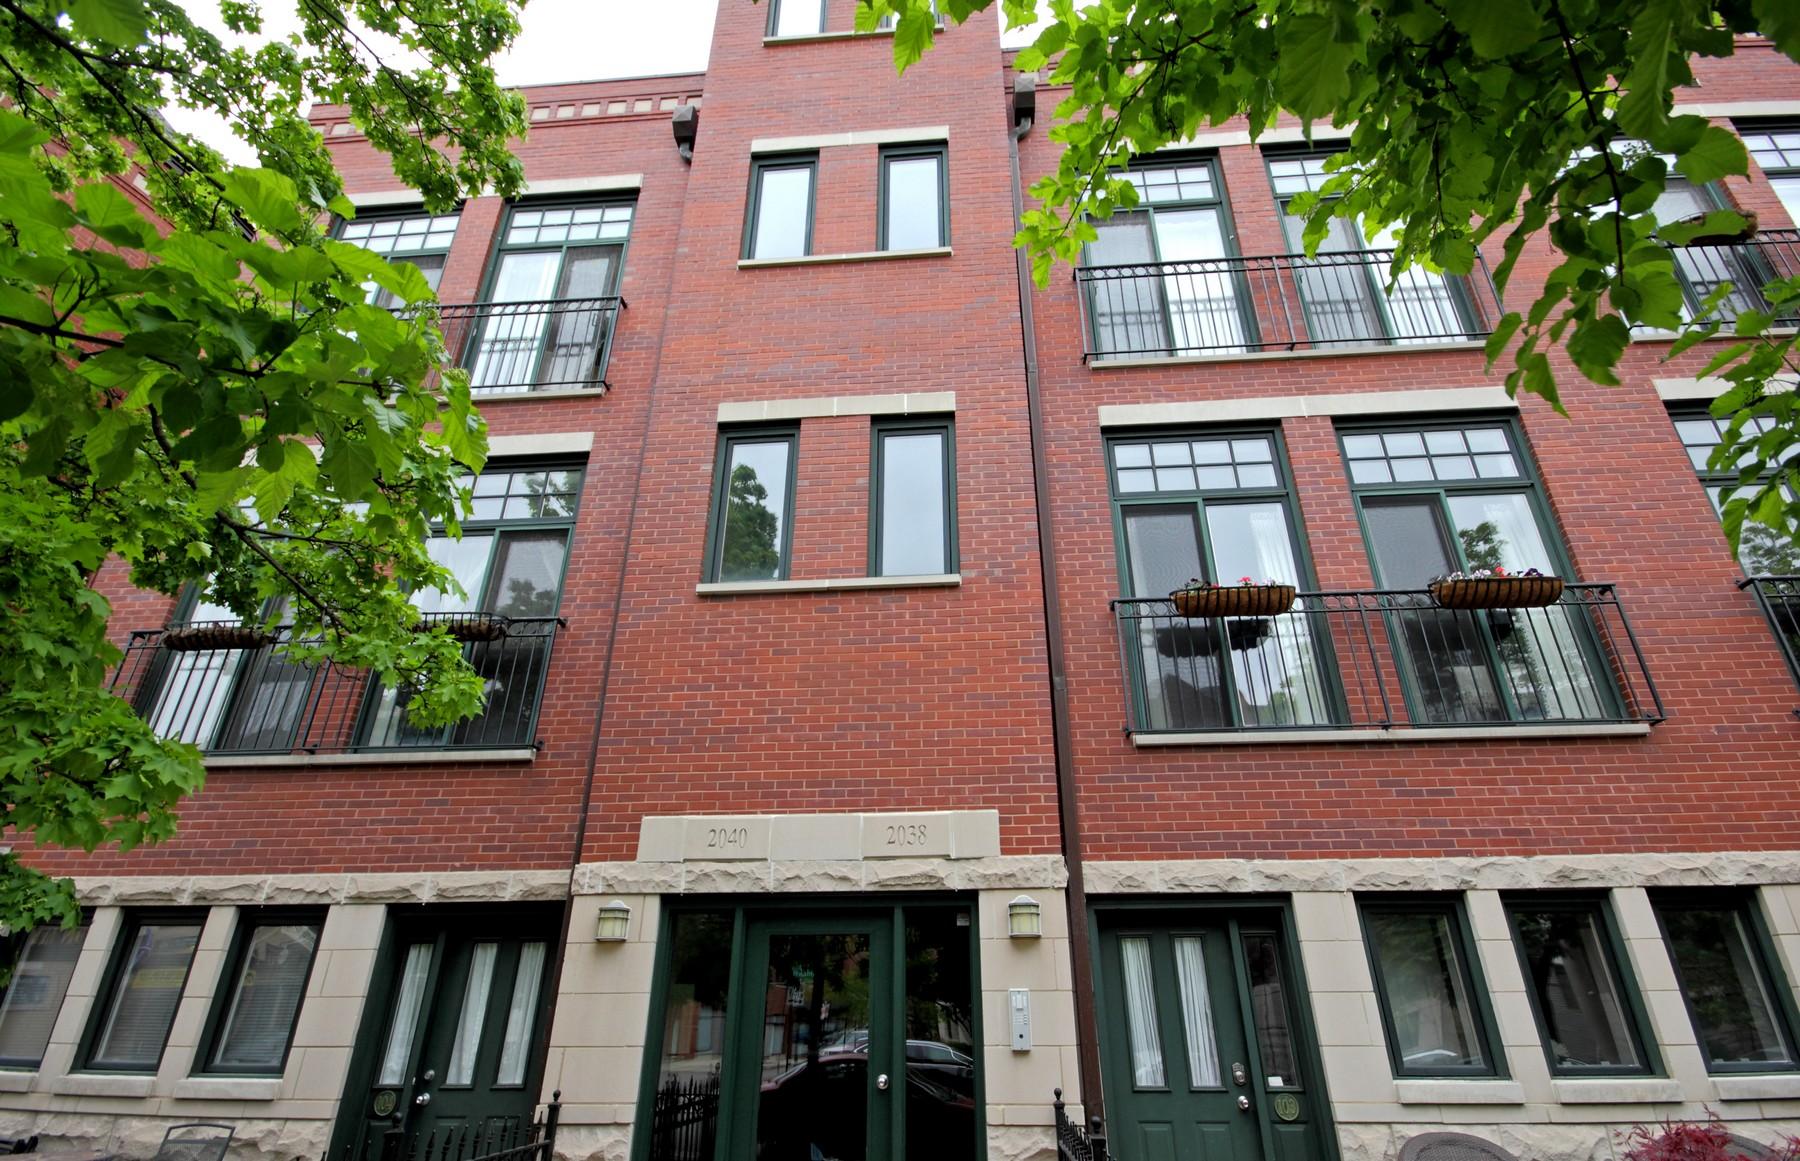 共管式独立产权公寓 为 销售 在 Beautiful North Center Duplexed Condo 2038 W Warner Avenue Unit 103 North Center, 芝加哥, 伊利诺斯州, 60618 美国